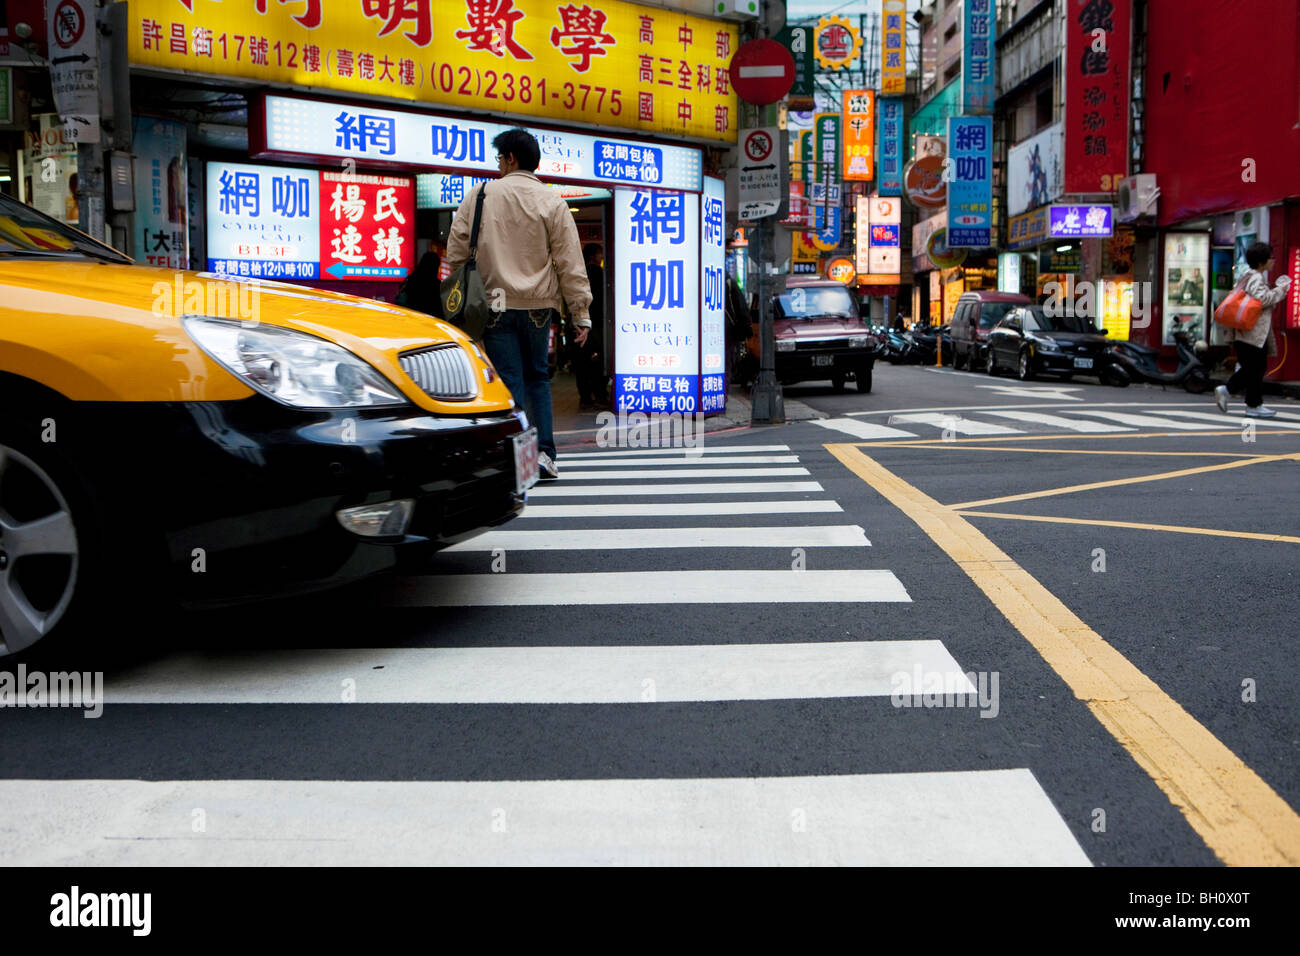 Street setting, taxi at main station district, Taipei, Taiwan, Asia - Stock Image